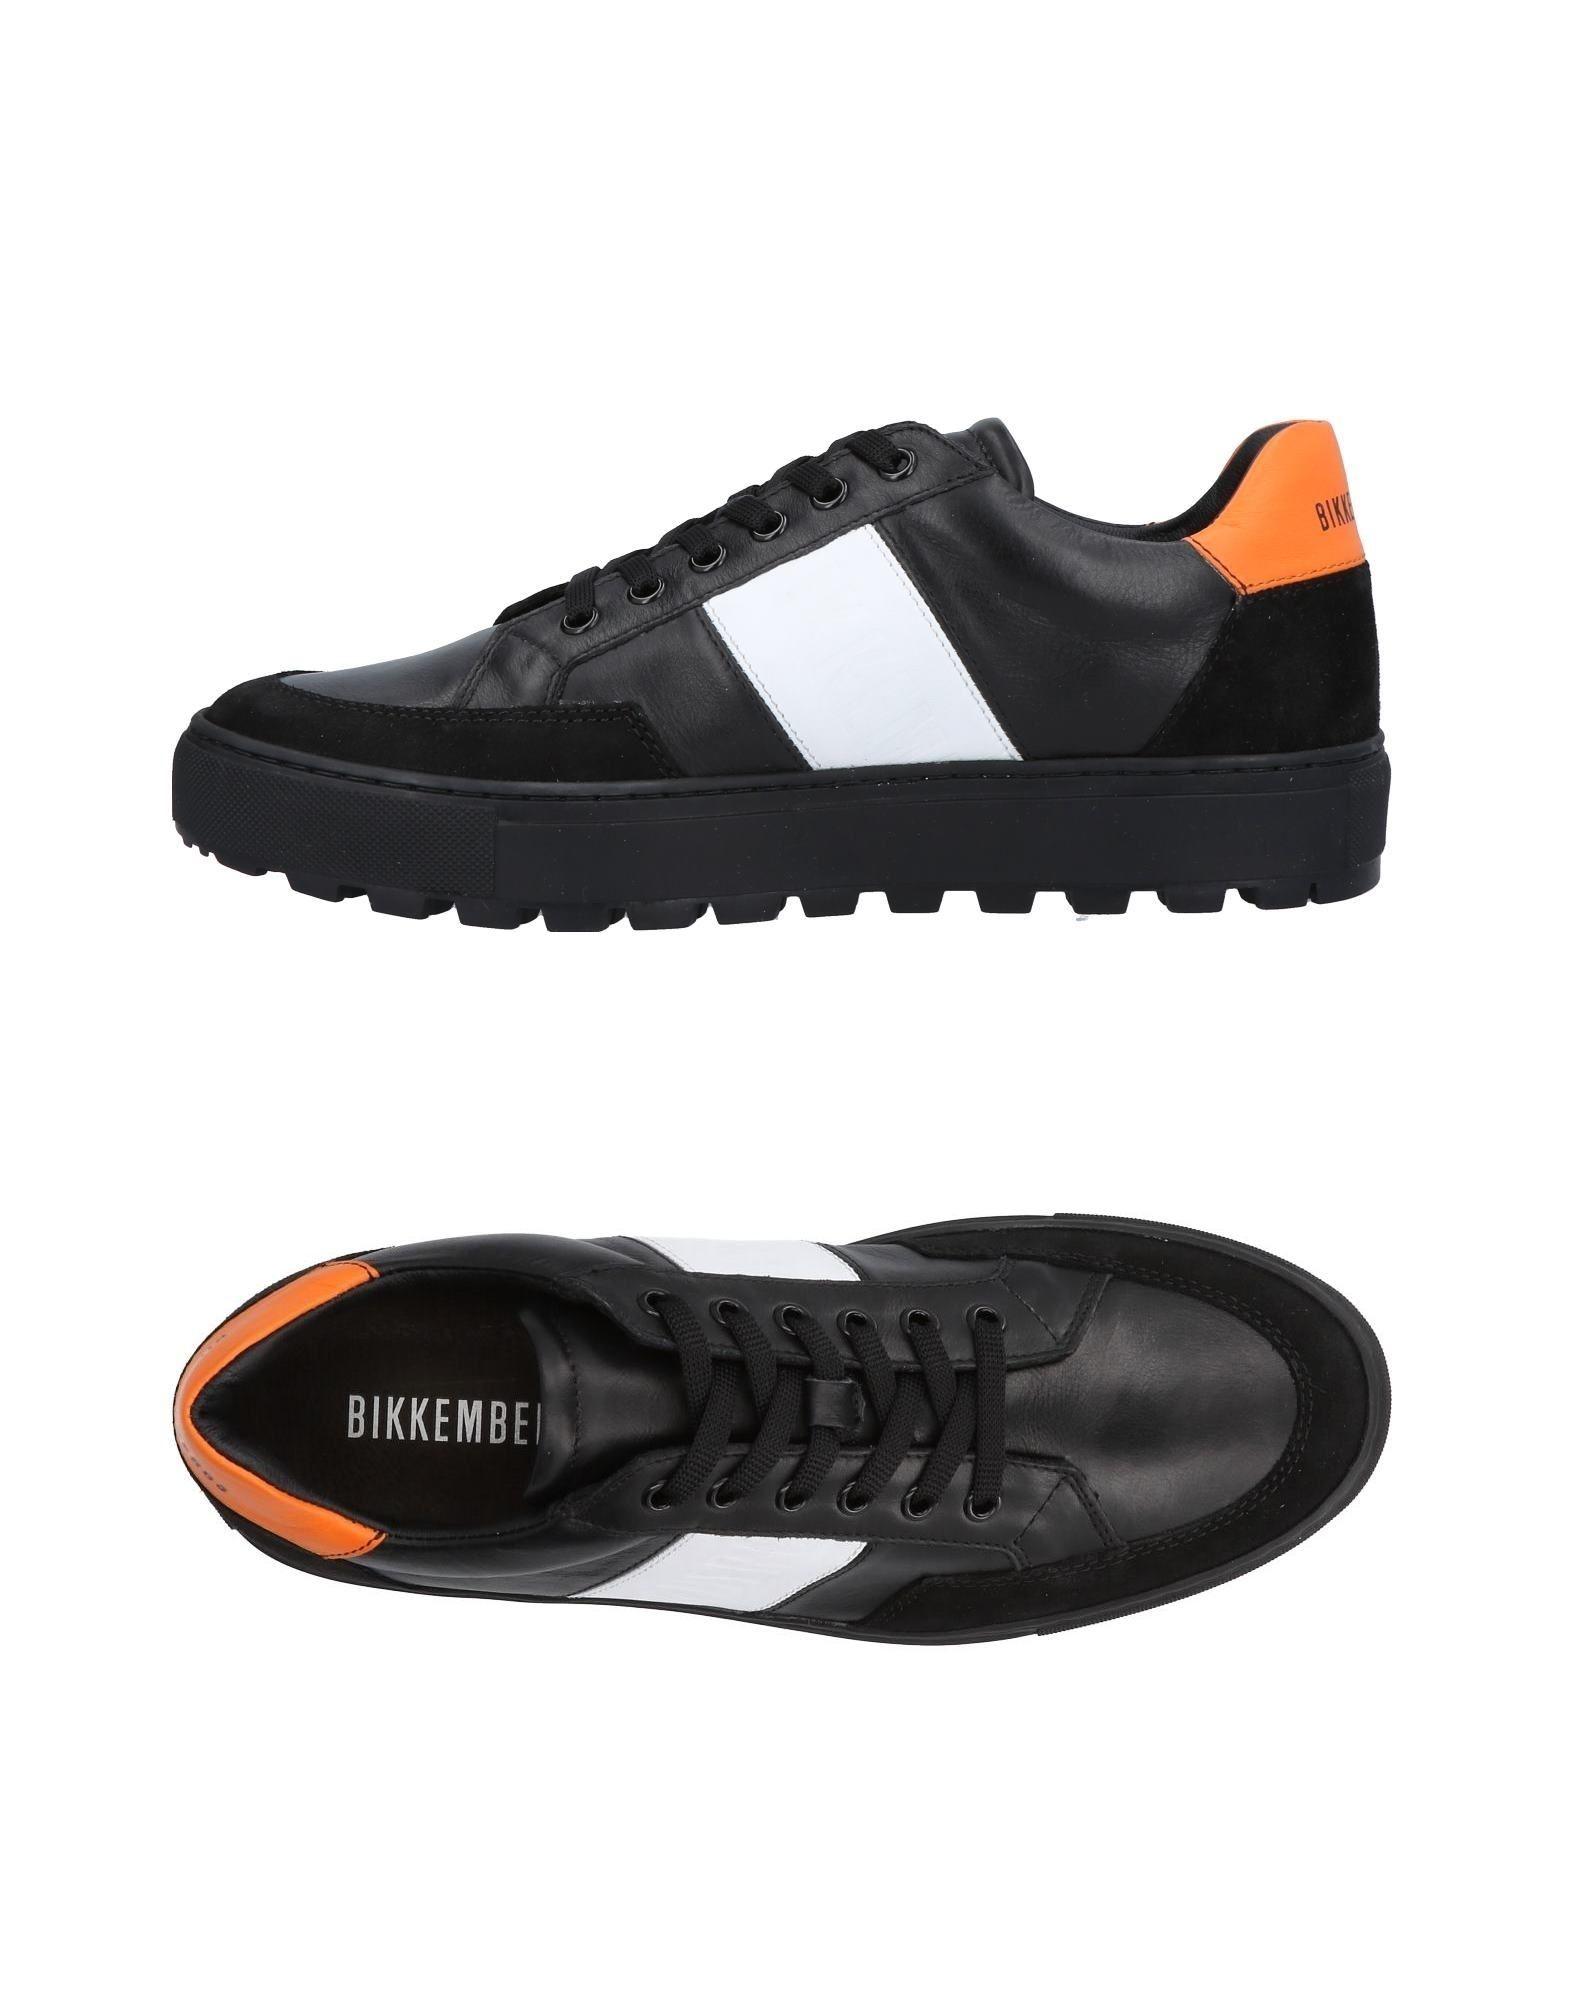 Bikkembergs Sneakers Herren  11451024AW Gute Qualität beliebte Schuhe